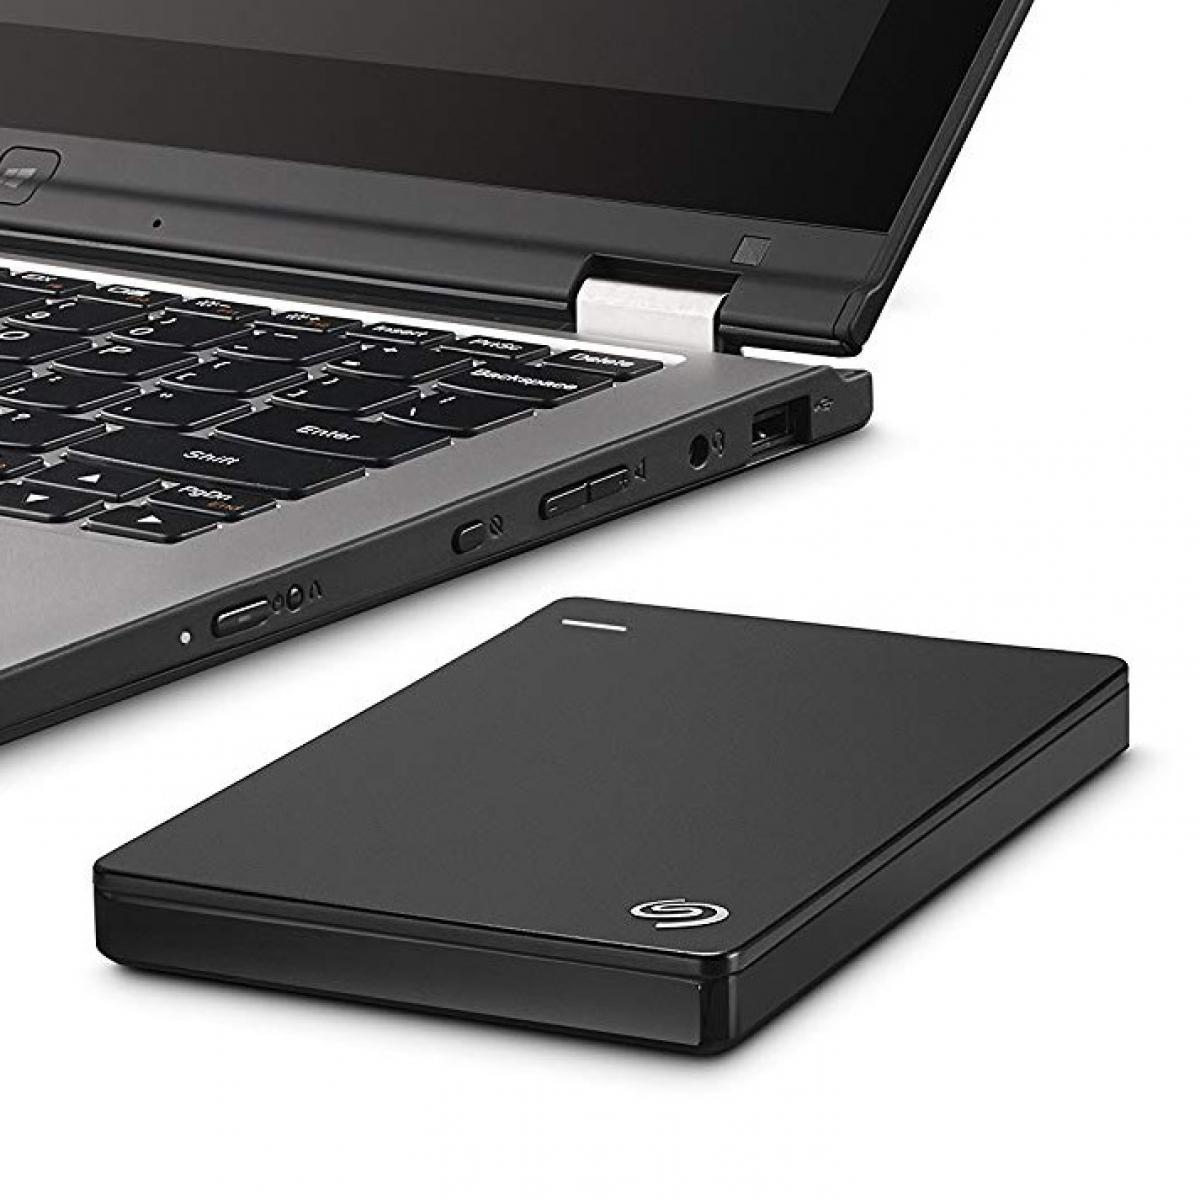 HD Externo Portátil Seagate Backup Plus SLim, 1TB, USB 3.0 Preto, STDR1000100